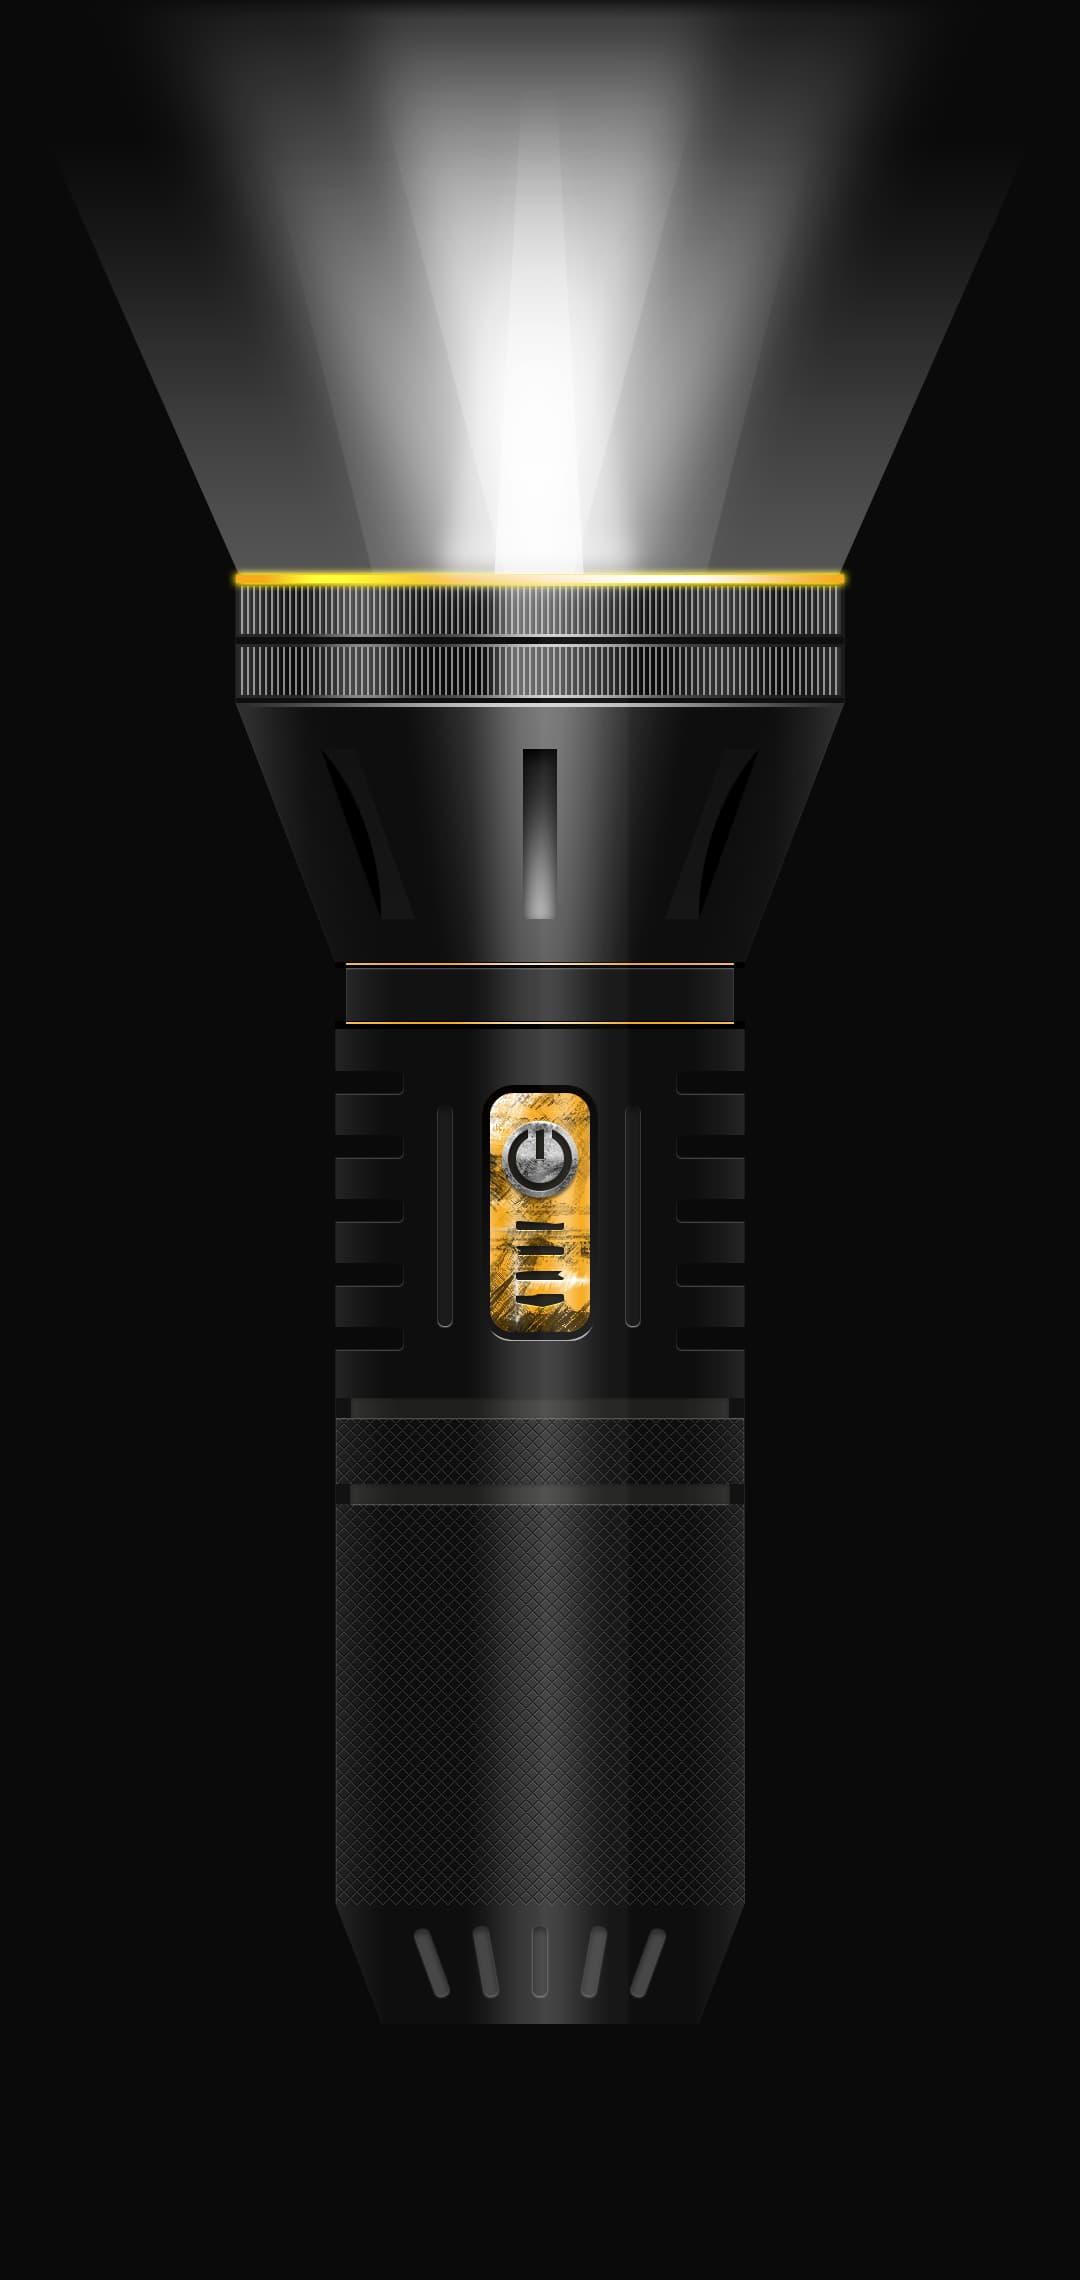 B2021 F150 Mode2